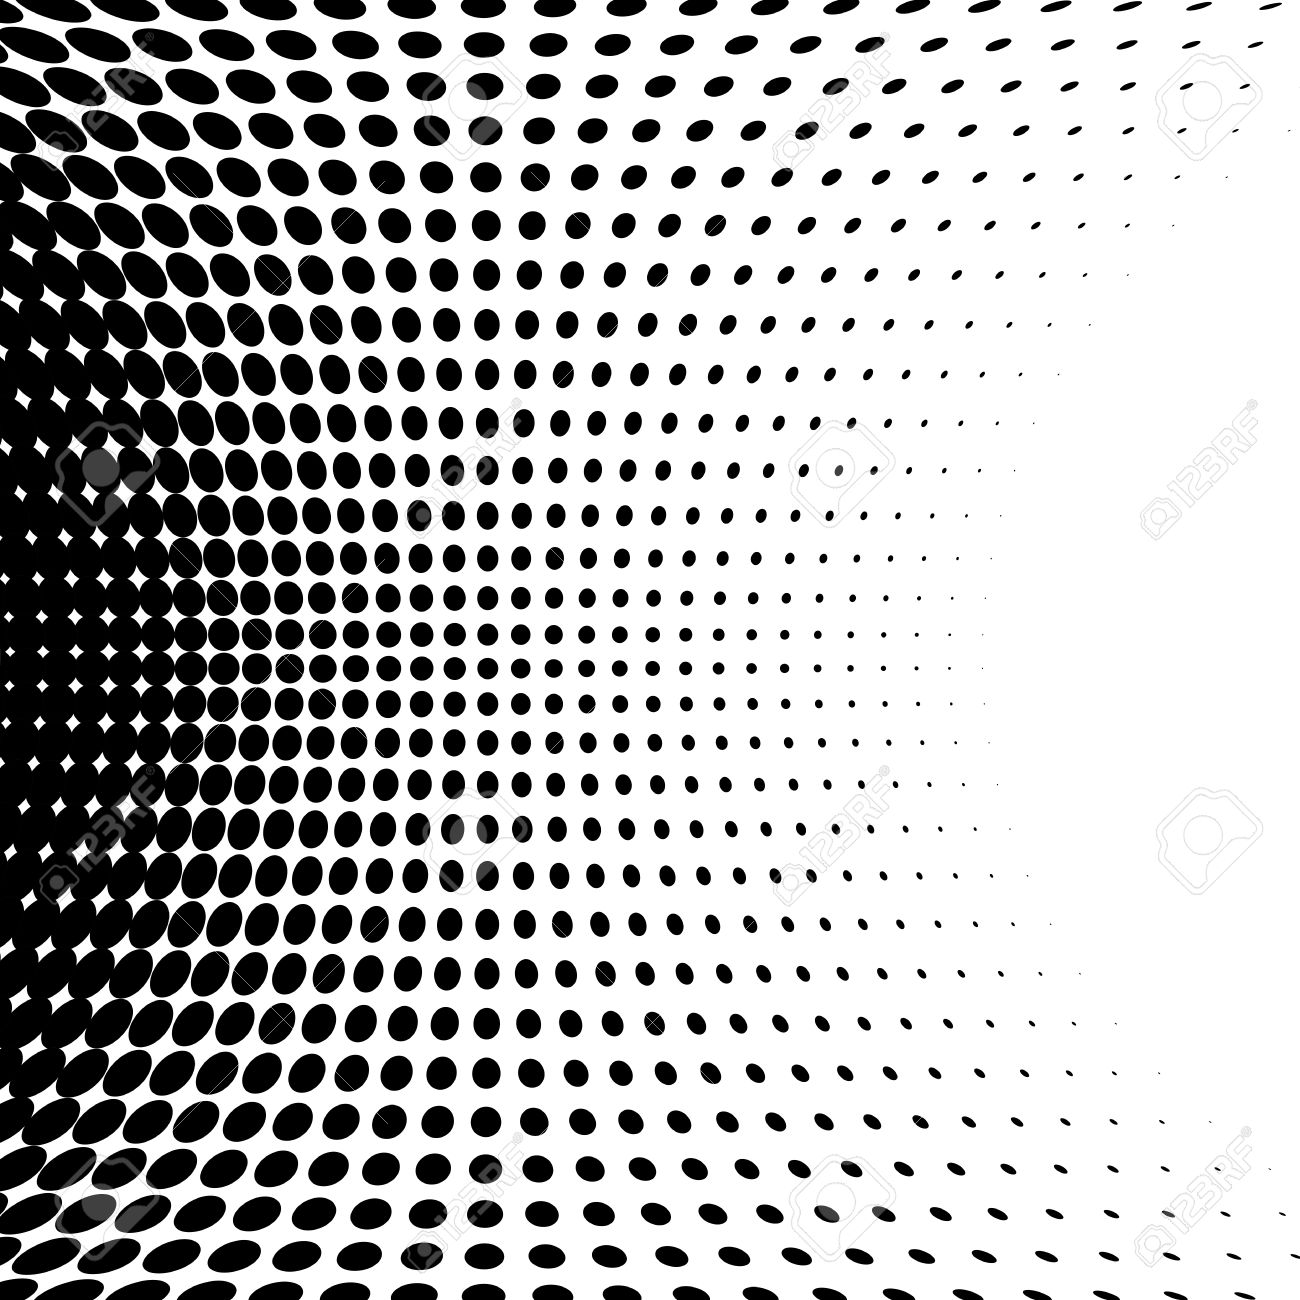 halftone illustrator halftone dots halftone effect halftone rh 123rf com halftone vector free halftone vector texture